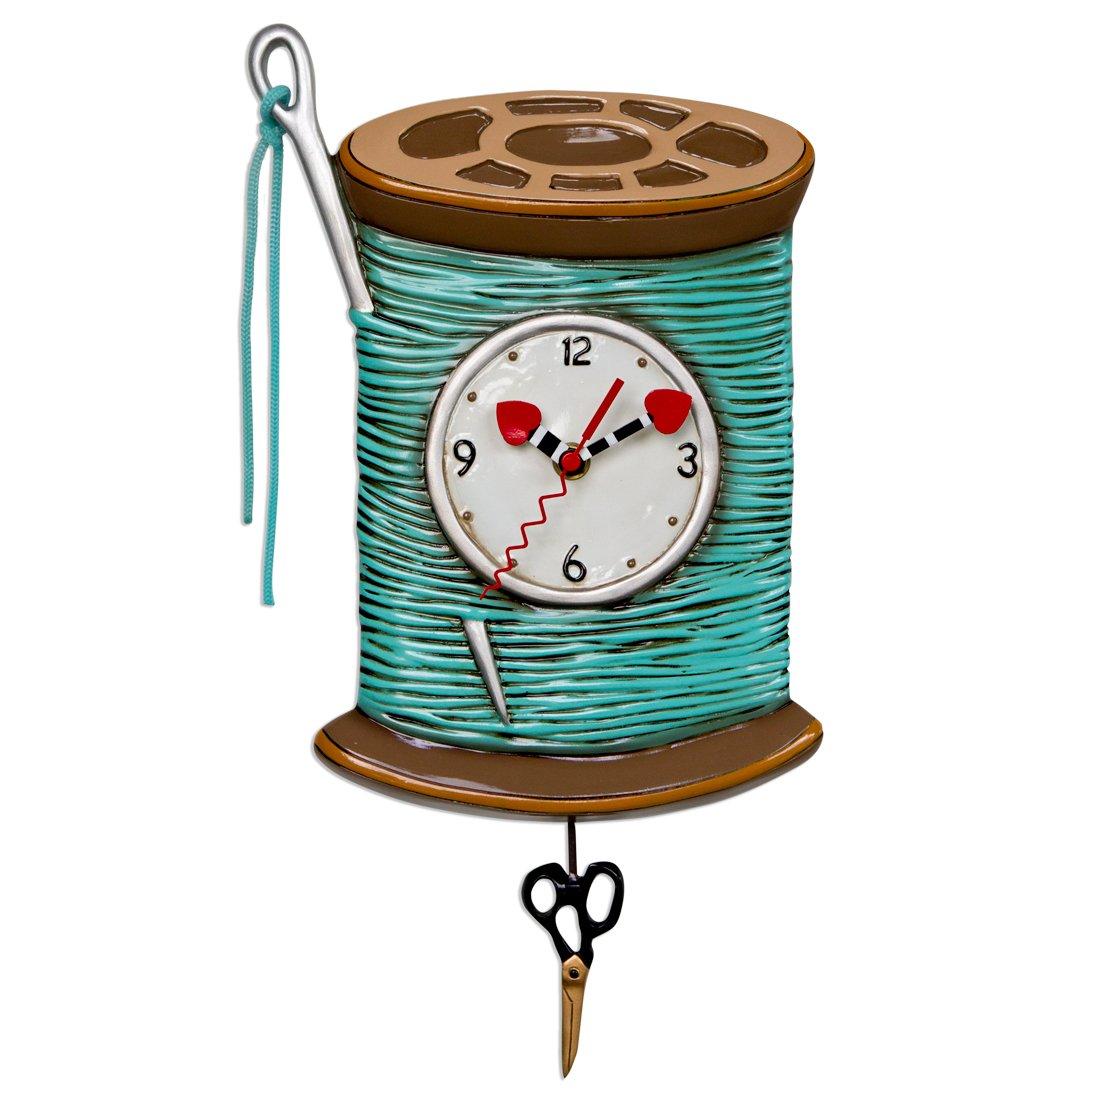 Allen Designs - P1810 Needle & Thread Clock